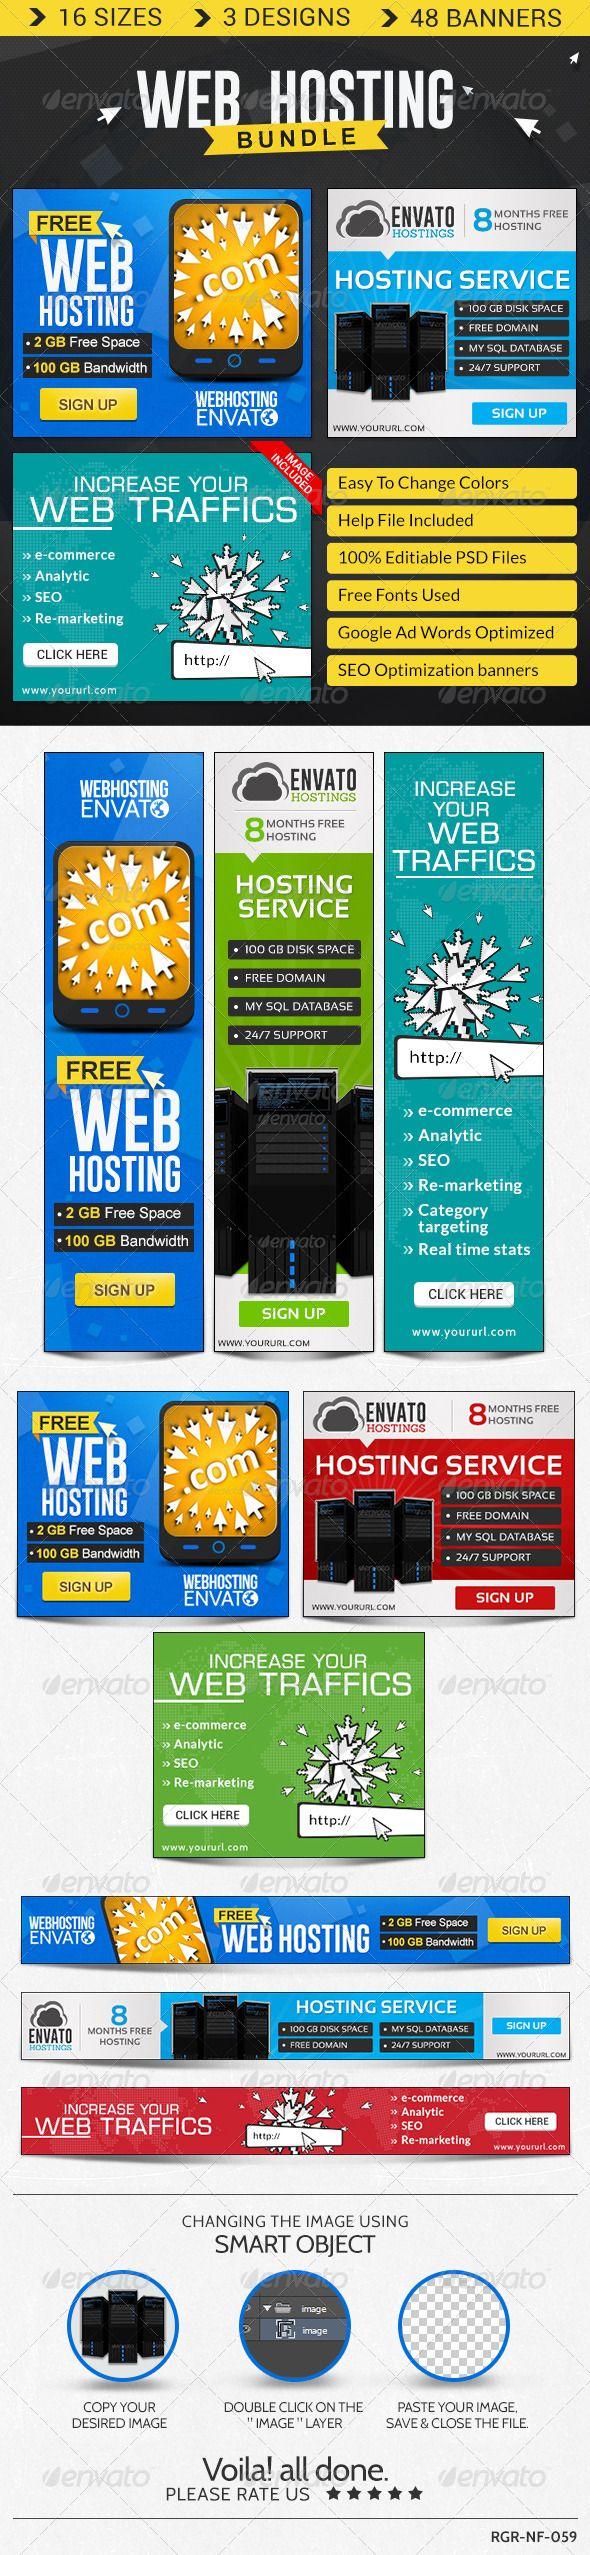 Web Hosting Banner Bundle - 3 Sets Template PSD | Buy and Download: http://graphicriver.net/item/web-hosting-banner-bundle-3-sets/8621539?WT.ac=category_thumb&WT.z_author=BannerDesignCo&ref=ksioks